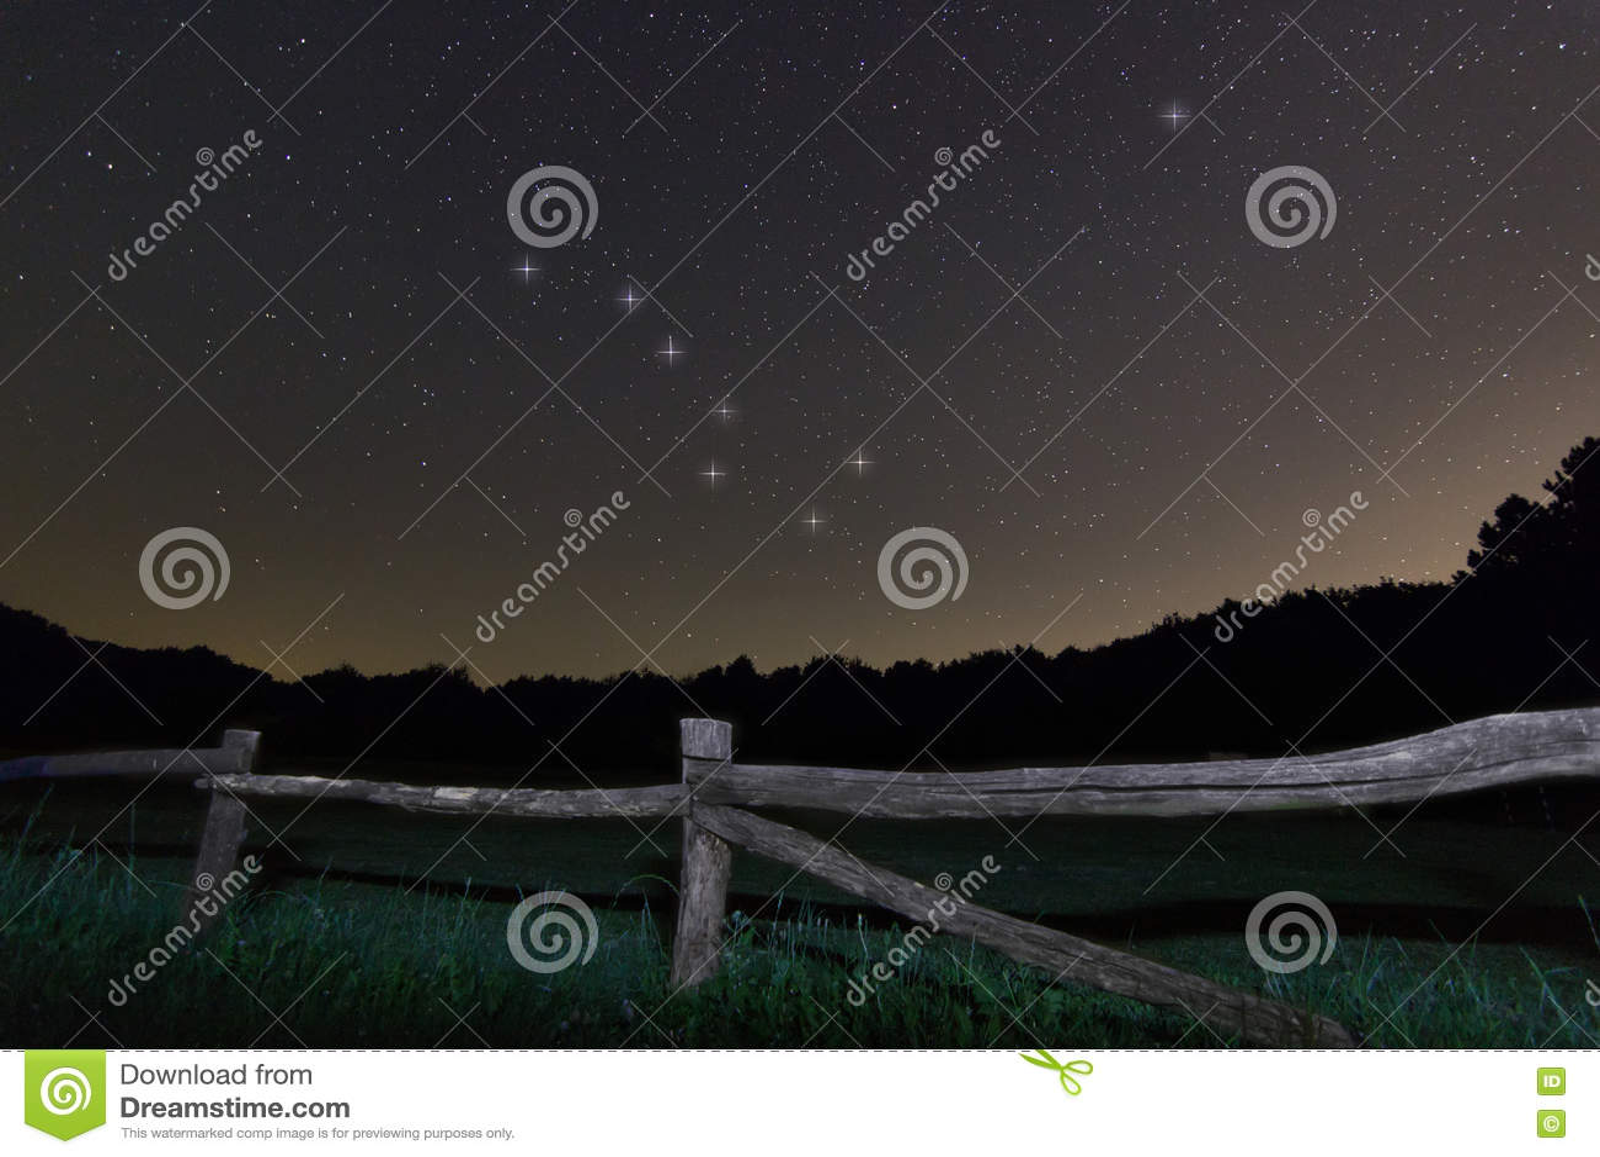 Old fence. Starry night Polaris star, Ursa Major,Big Dipper constellation Beautiful night sky.